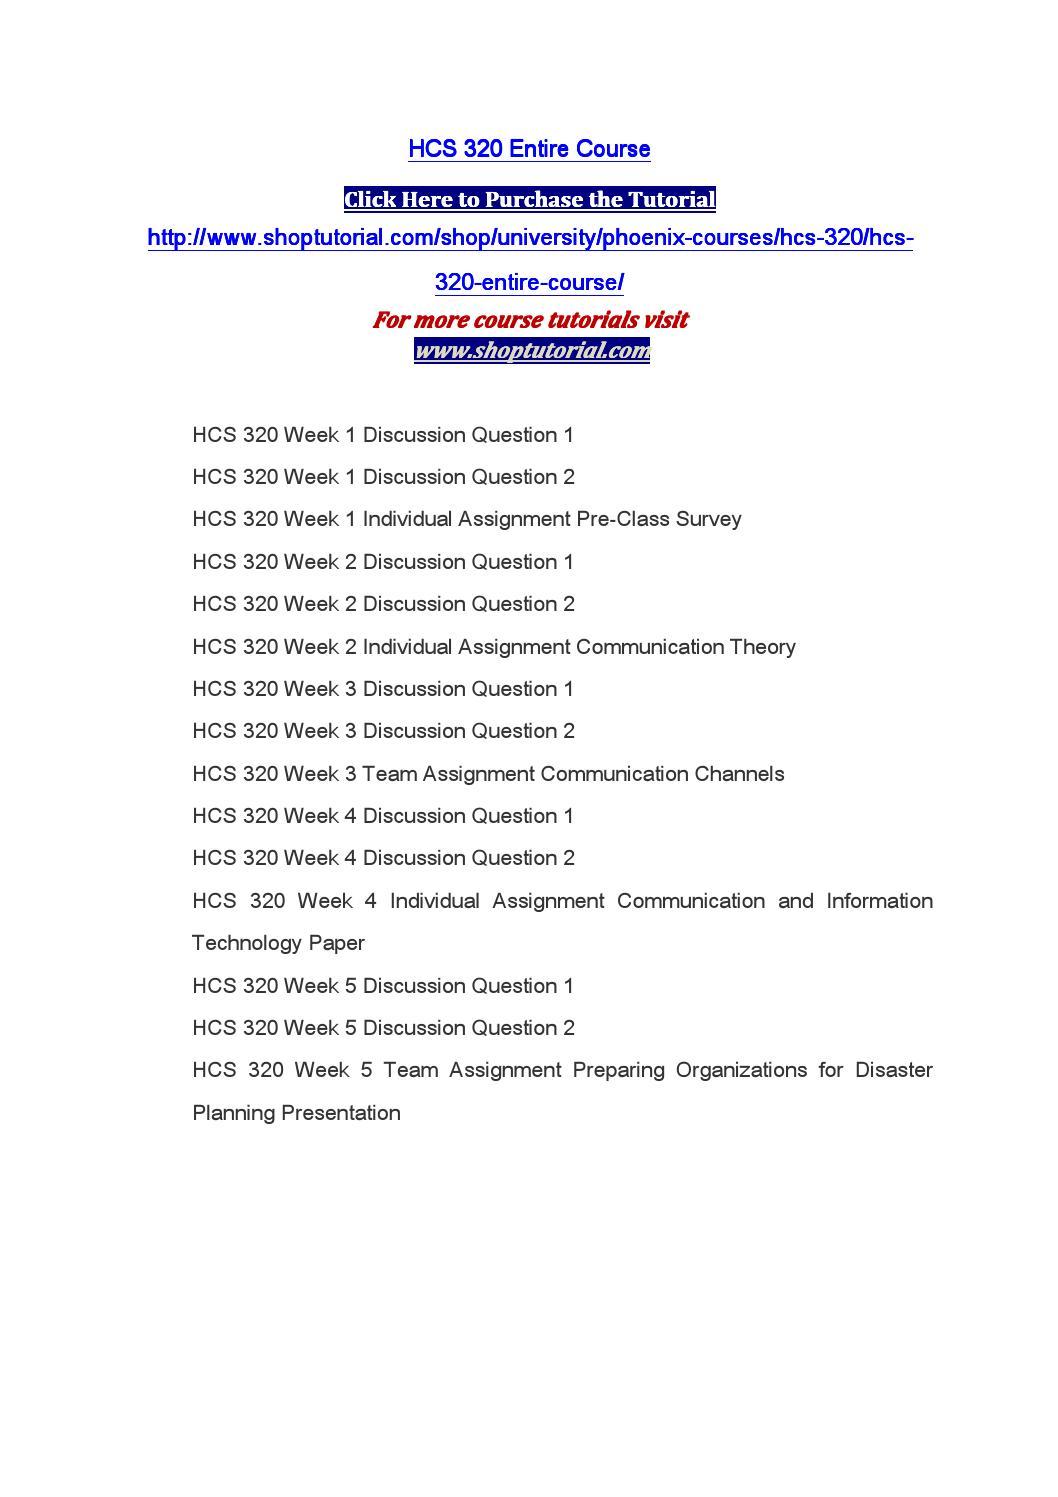 HSBC Sort Codes